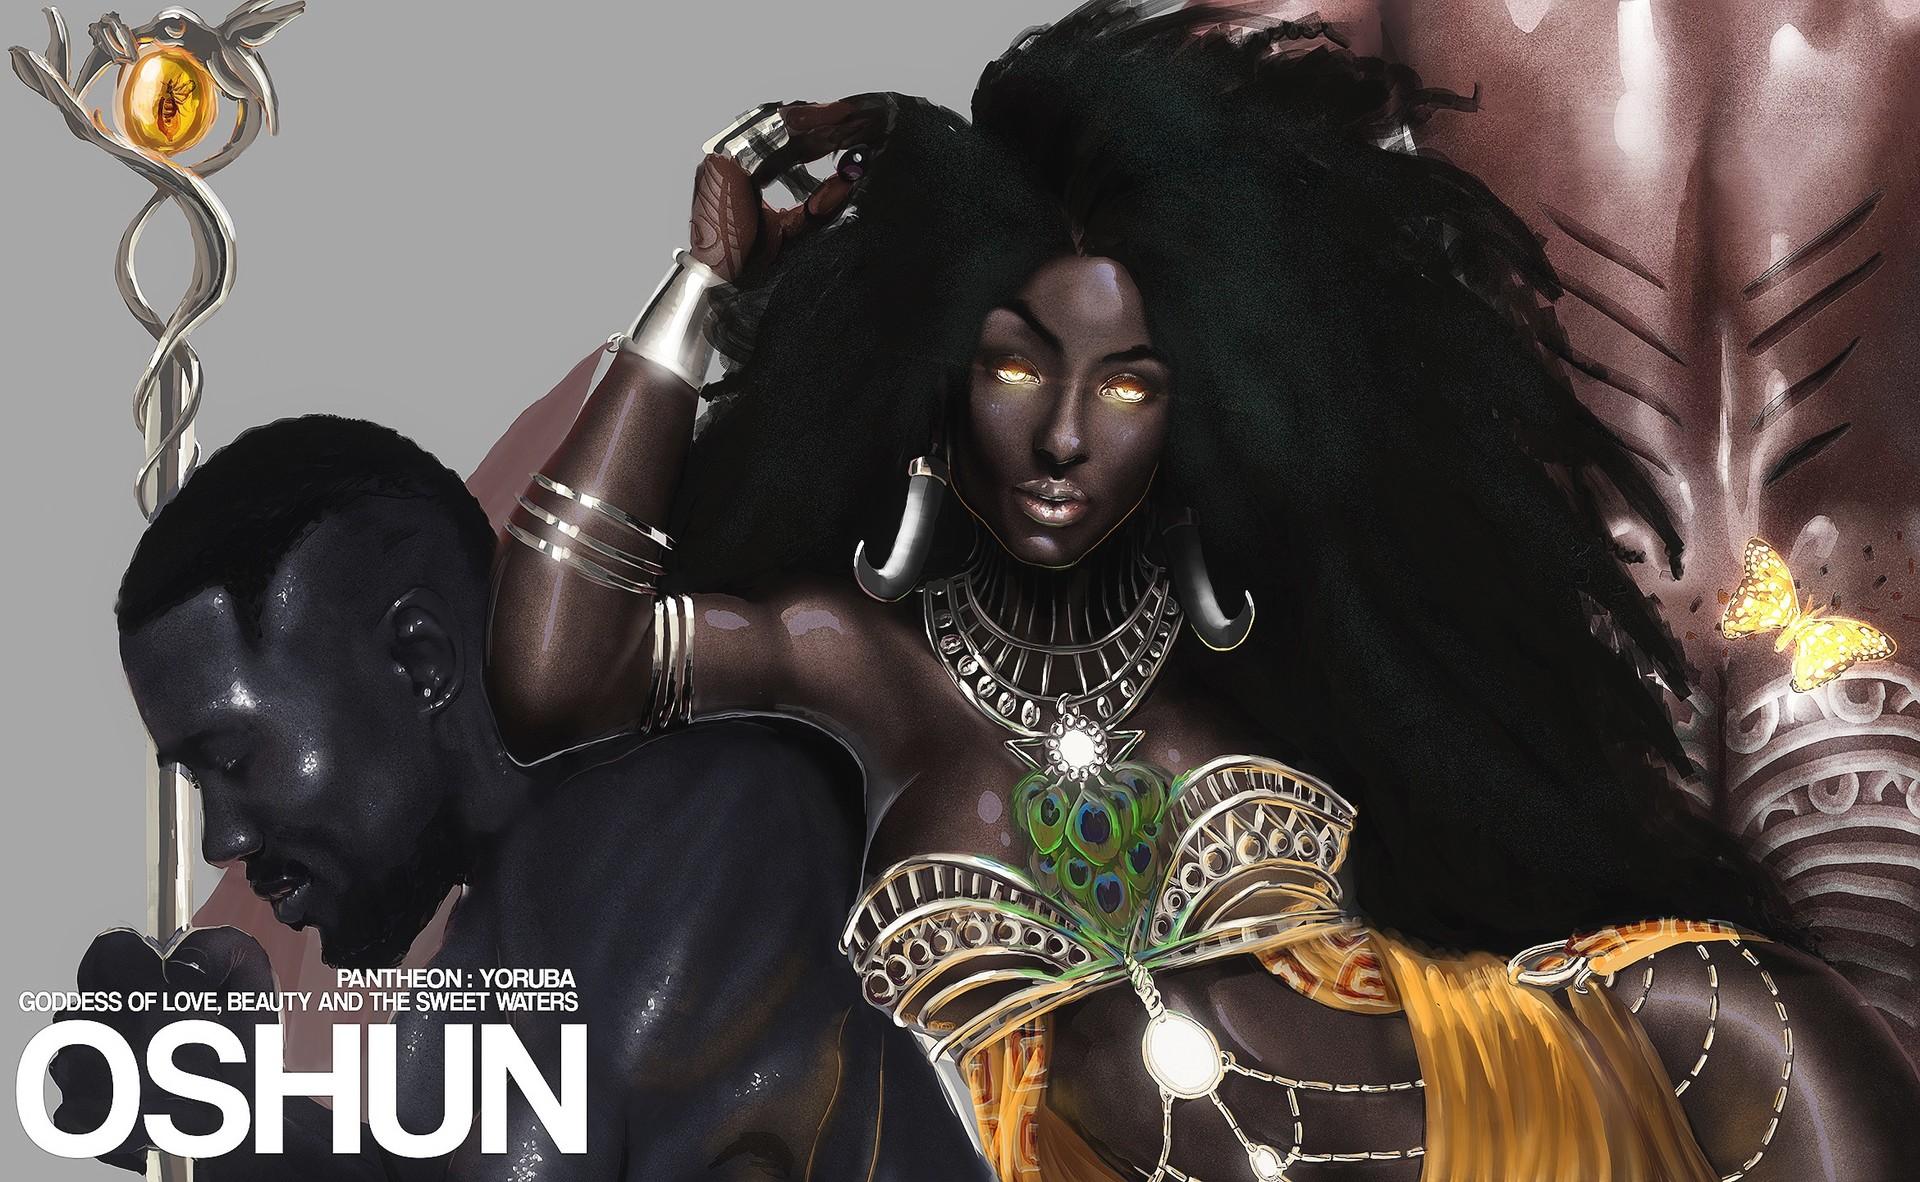 ArtStation - Oshun Goddess of Love, Christopher Pompey